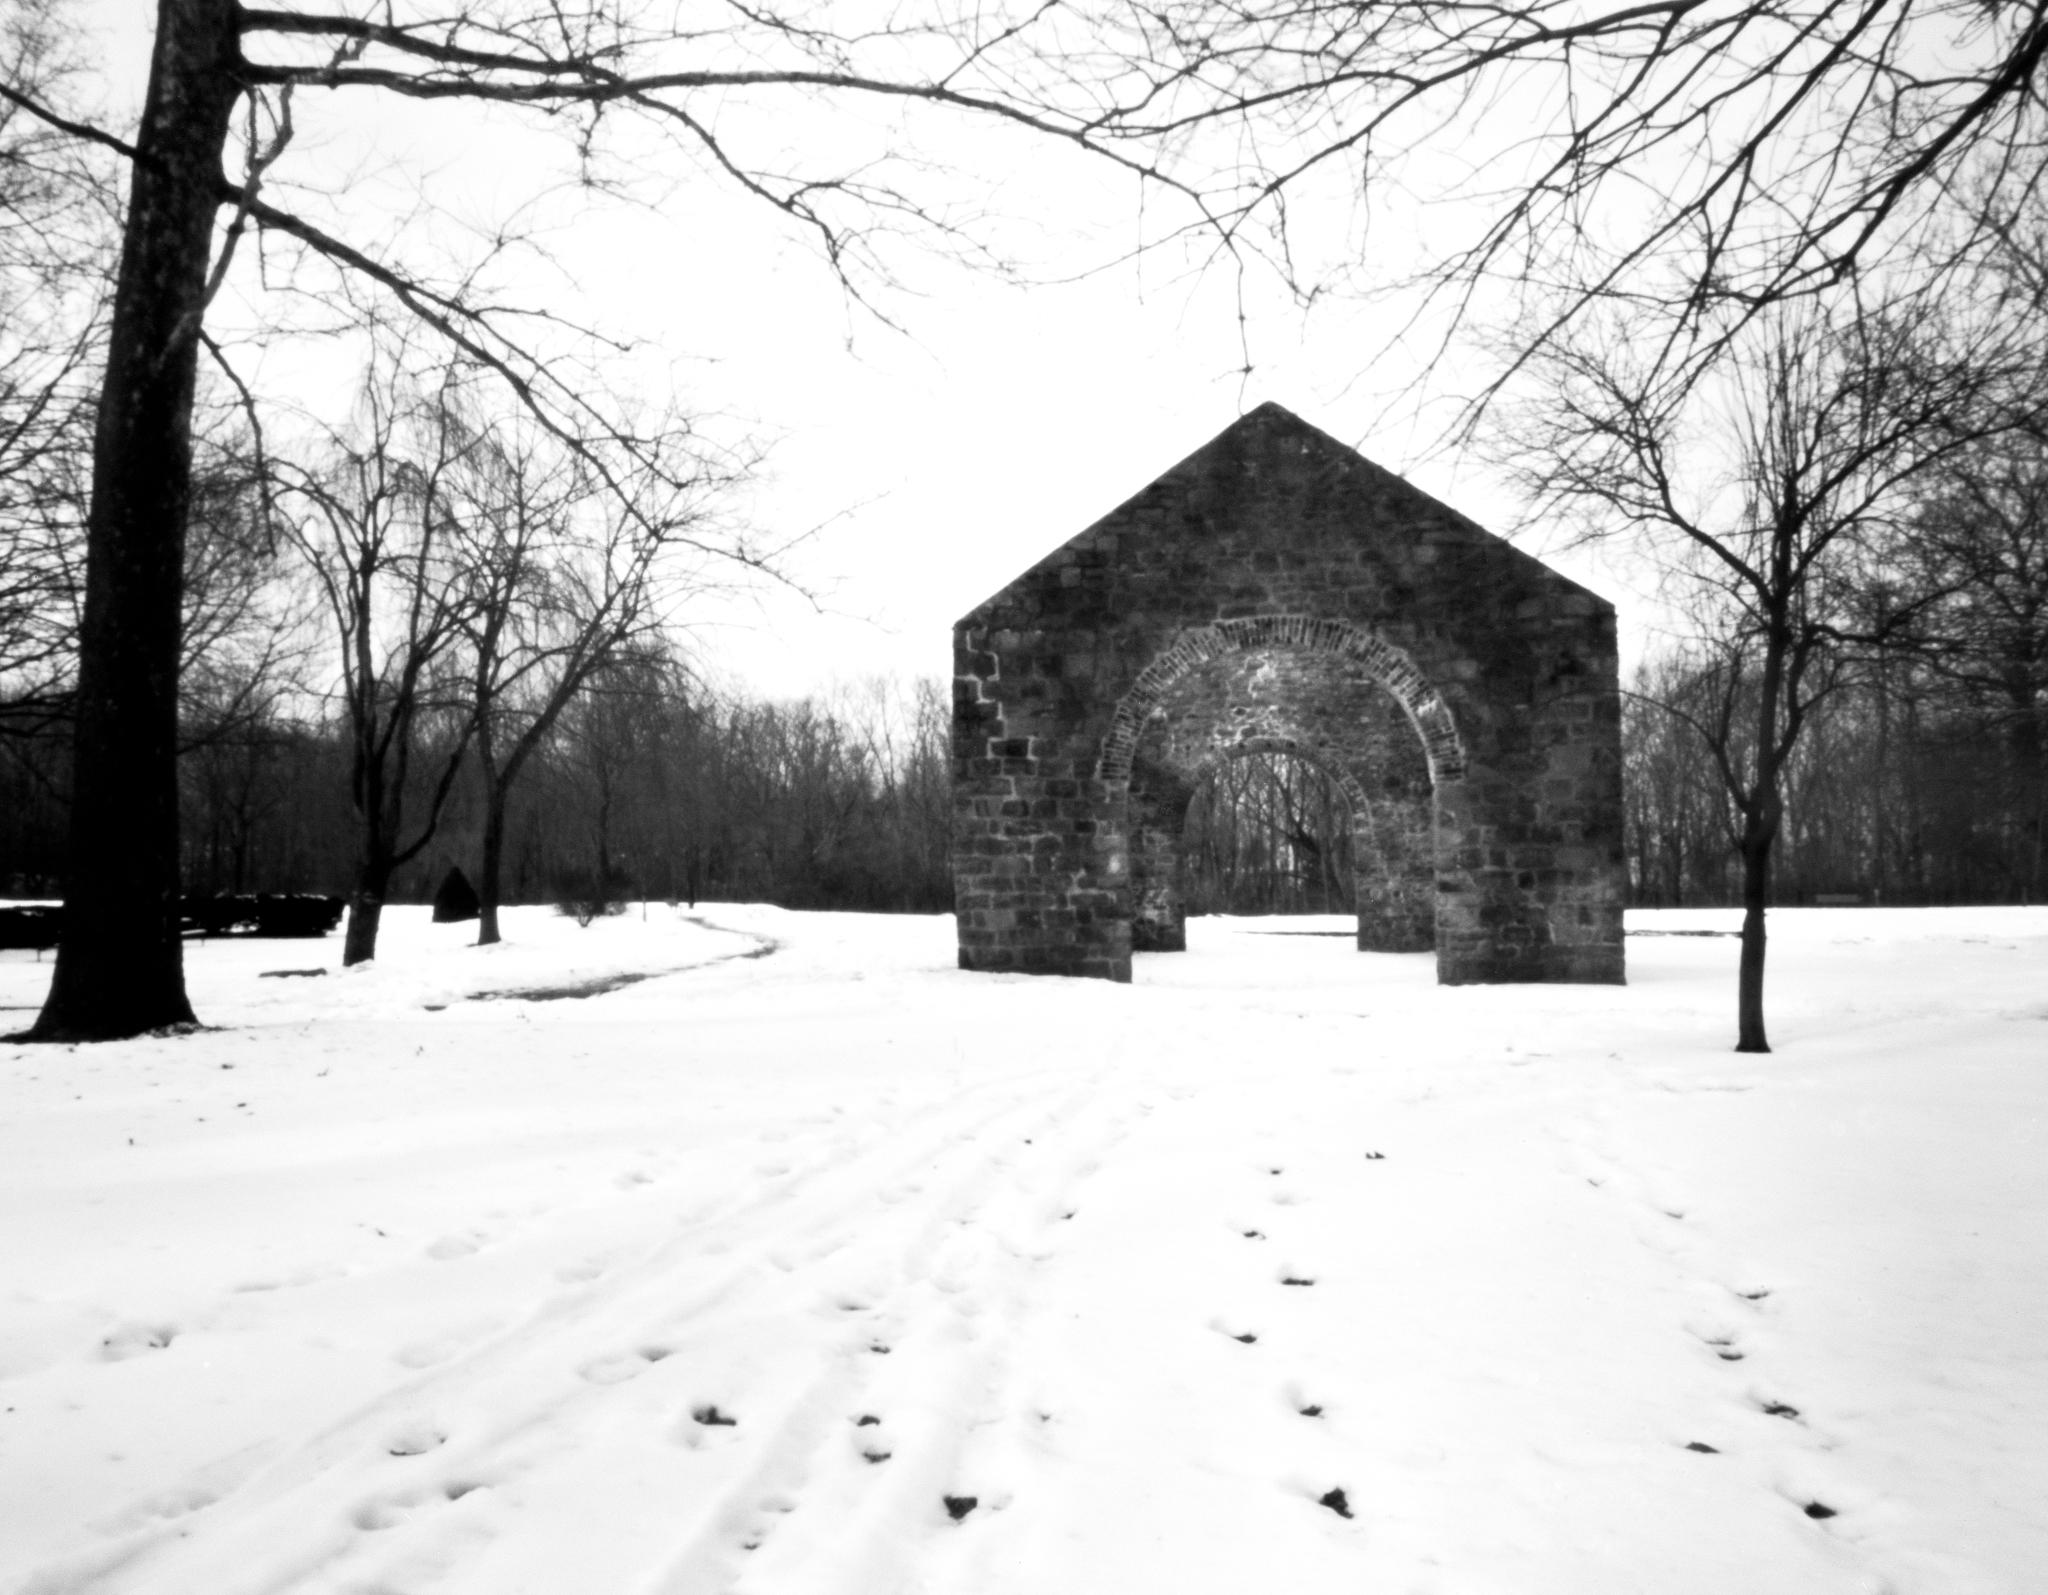 Lockridge Furnace ruins. Alburtis, Pennsylvania.Rob Kauzlarich built 90mm 4x5.